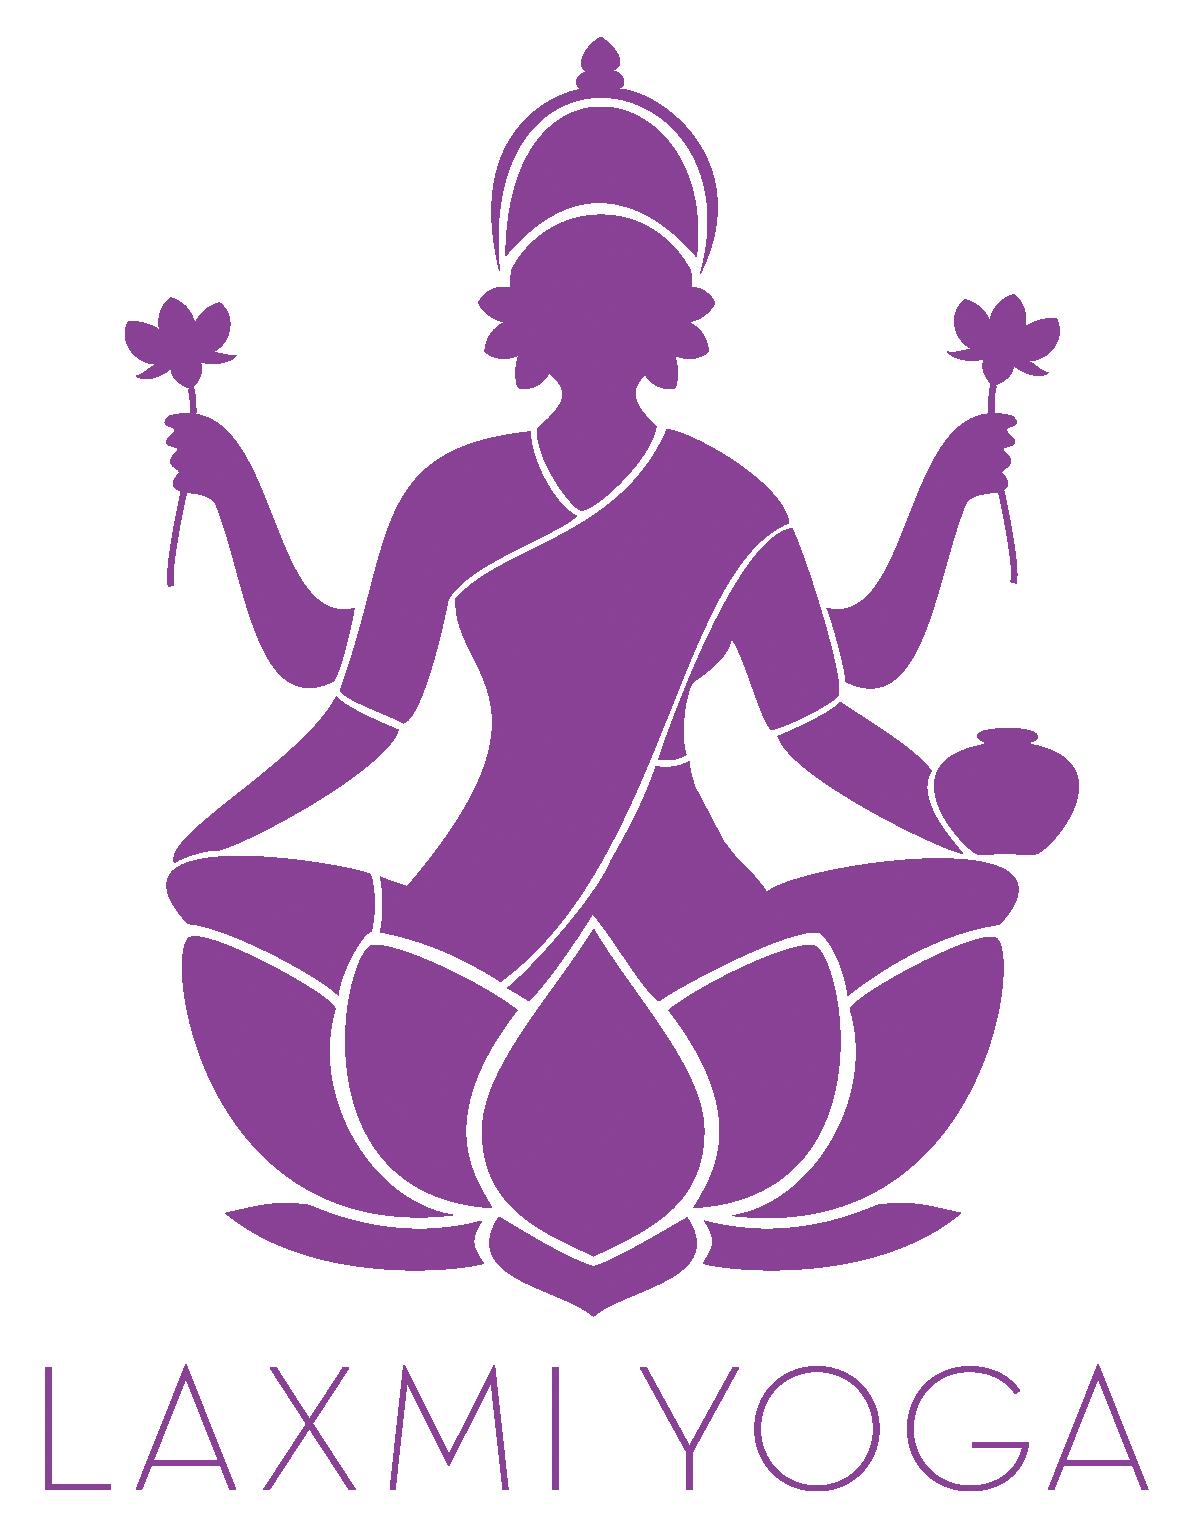 Yoga training course fees. Emotions clipart teacher workshop